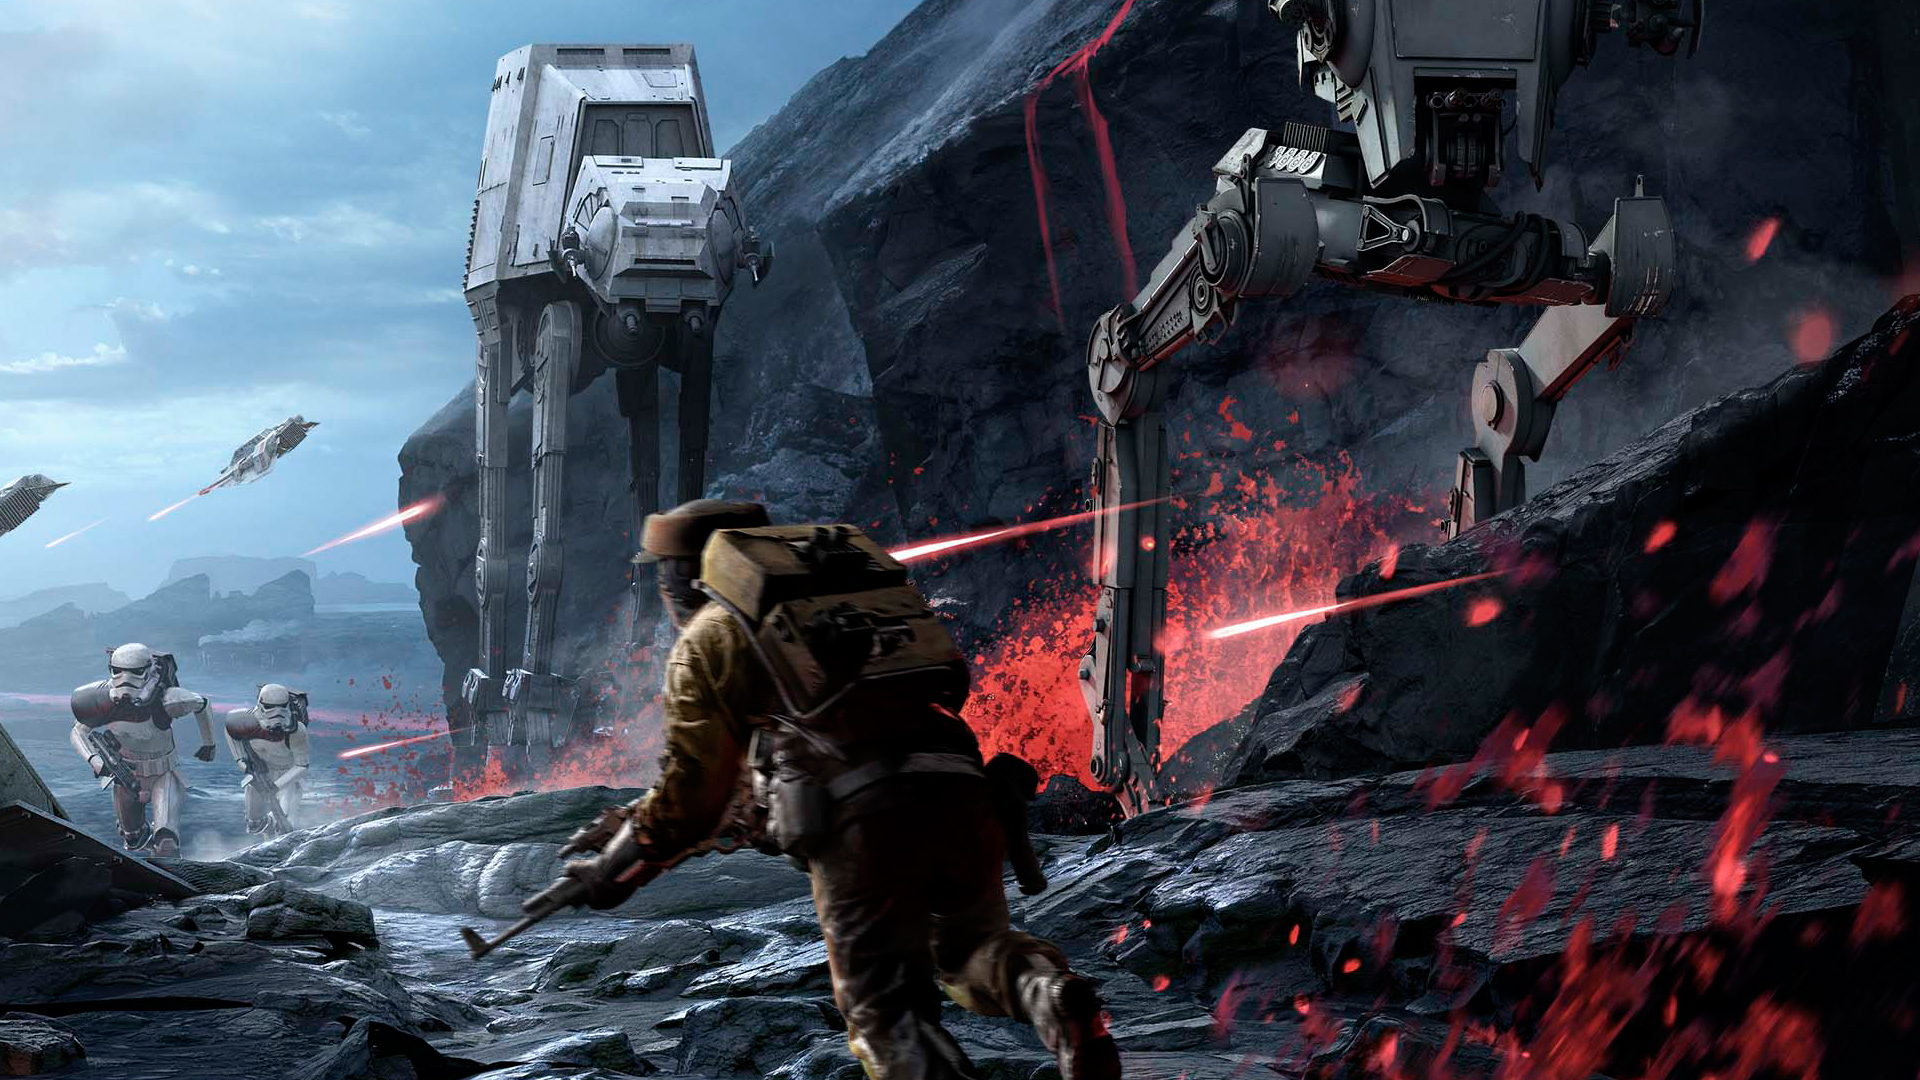 Star Wars Battlefront. Vulcano planet.